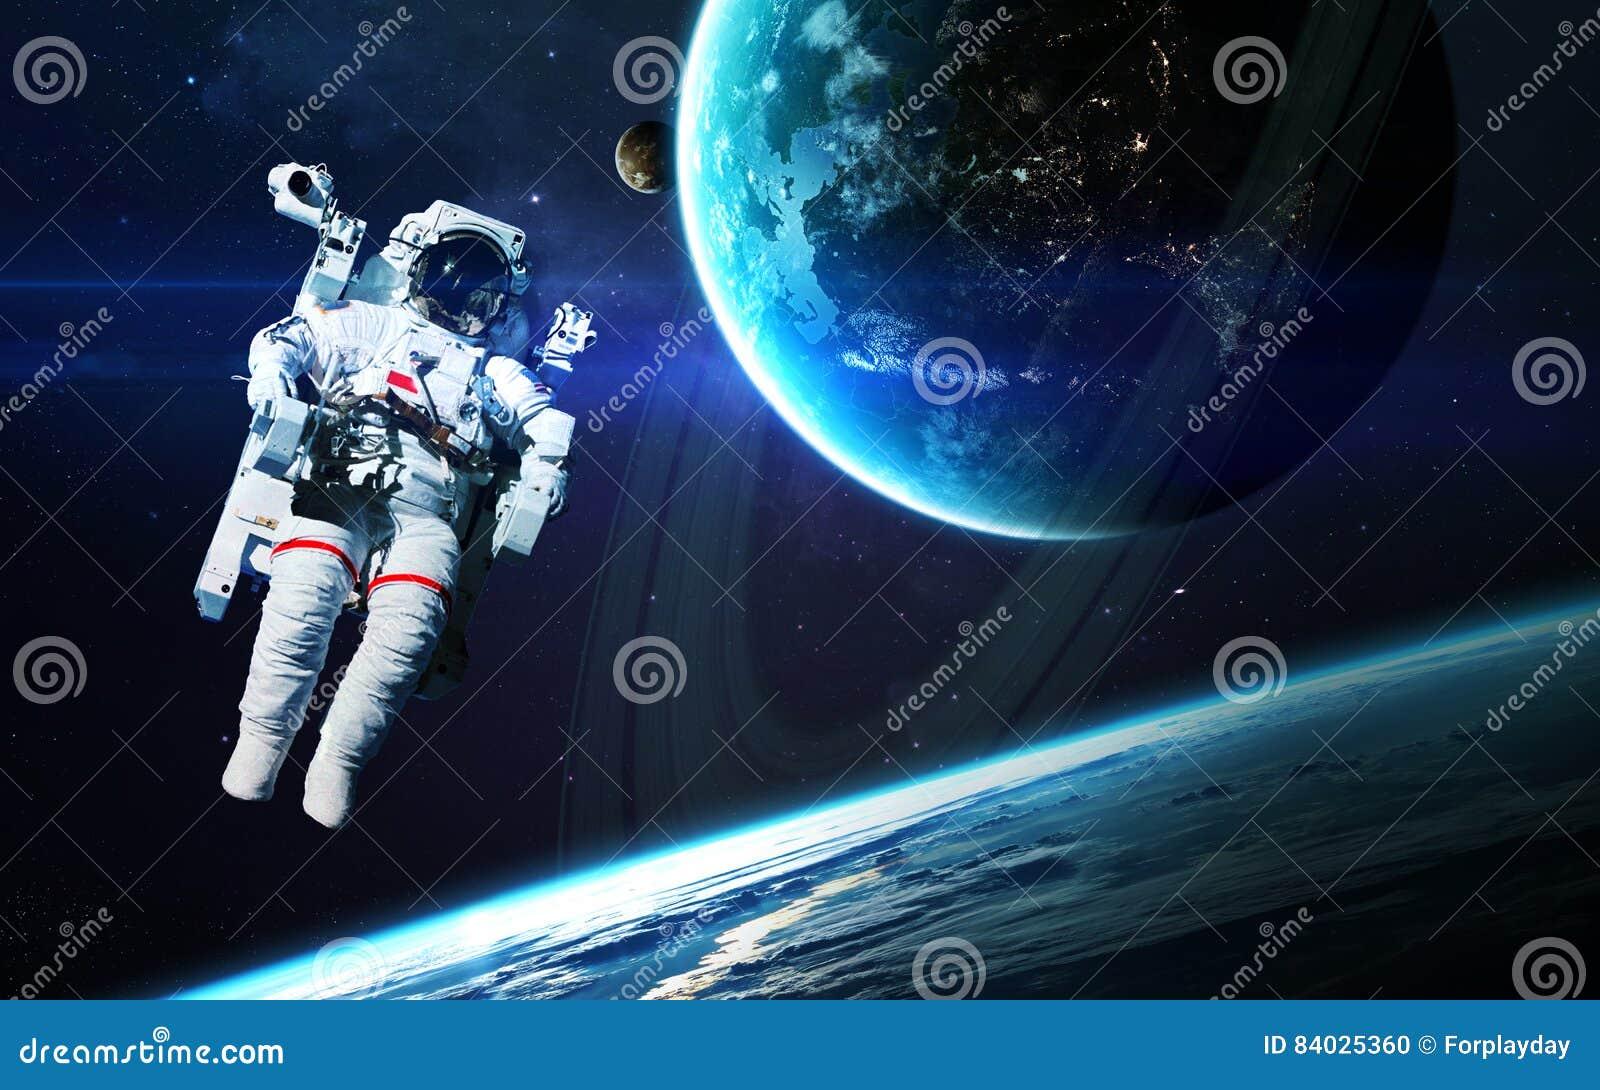 astronaut deep space - photo #4